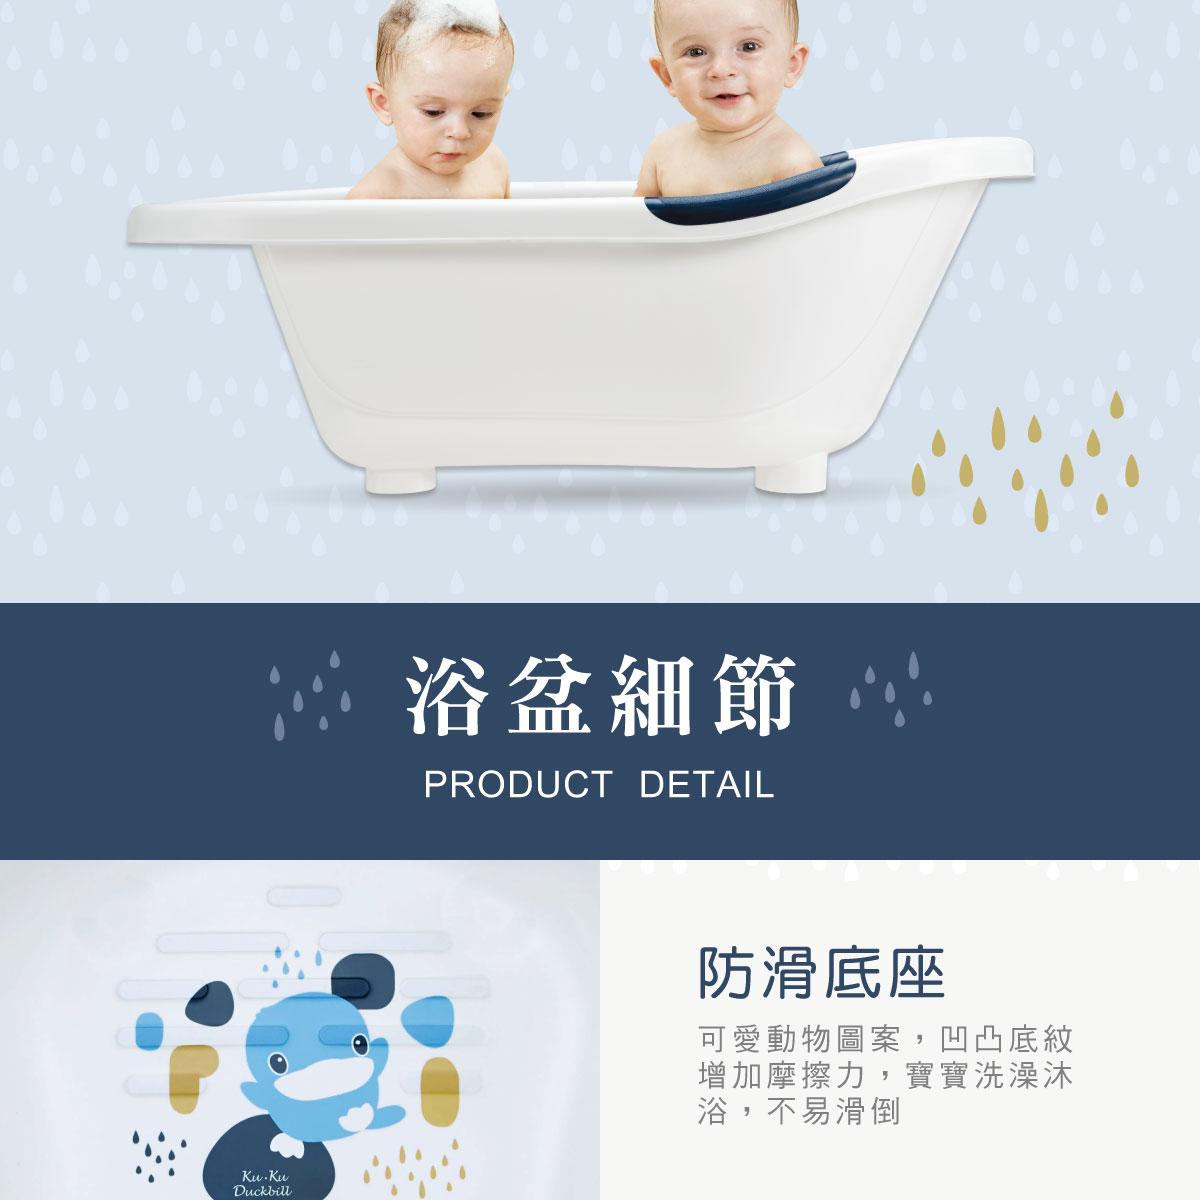 proimages/Bathing&CleanSeries/Bathing/BabyBathTub/1135/1135-成長印記浴盆-EDM-5.jpg